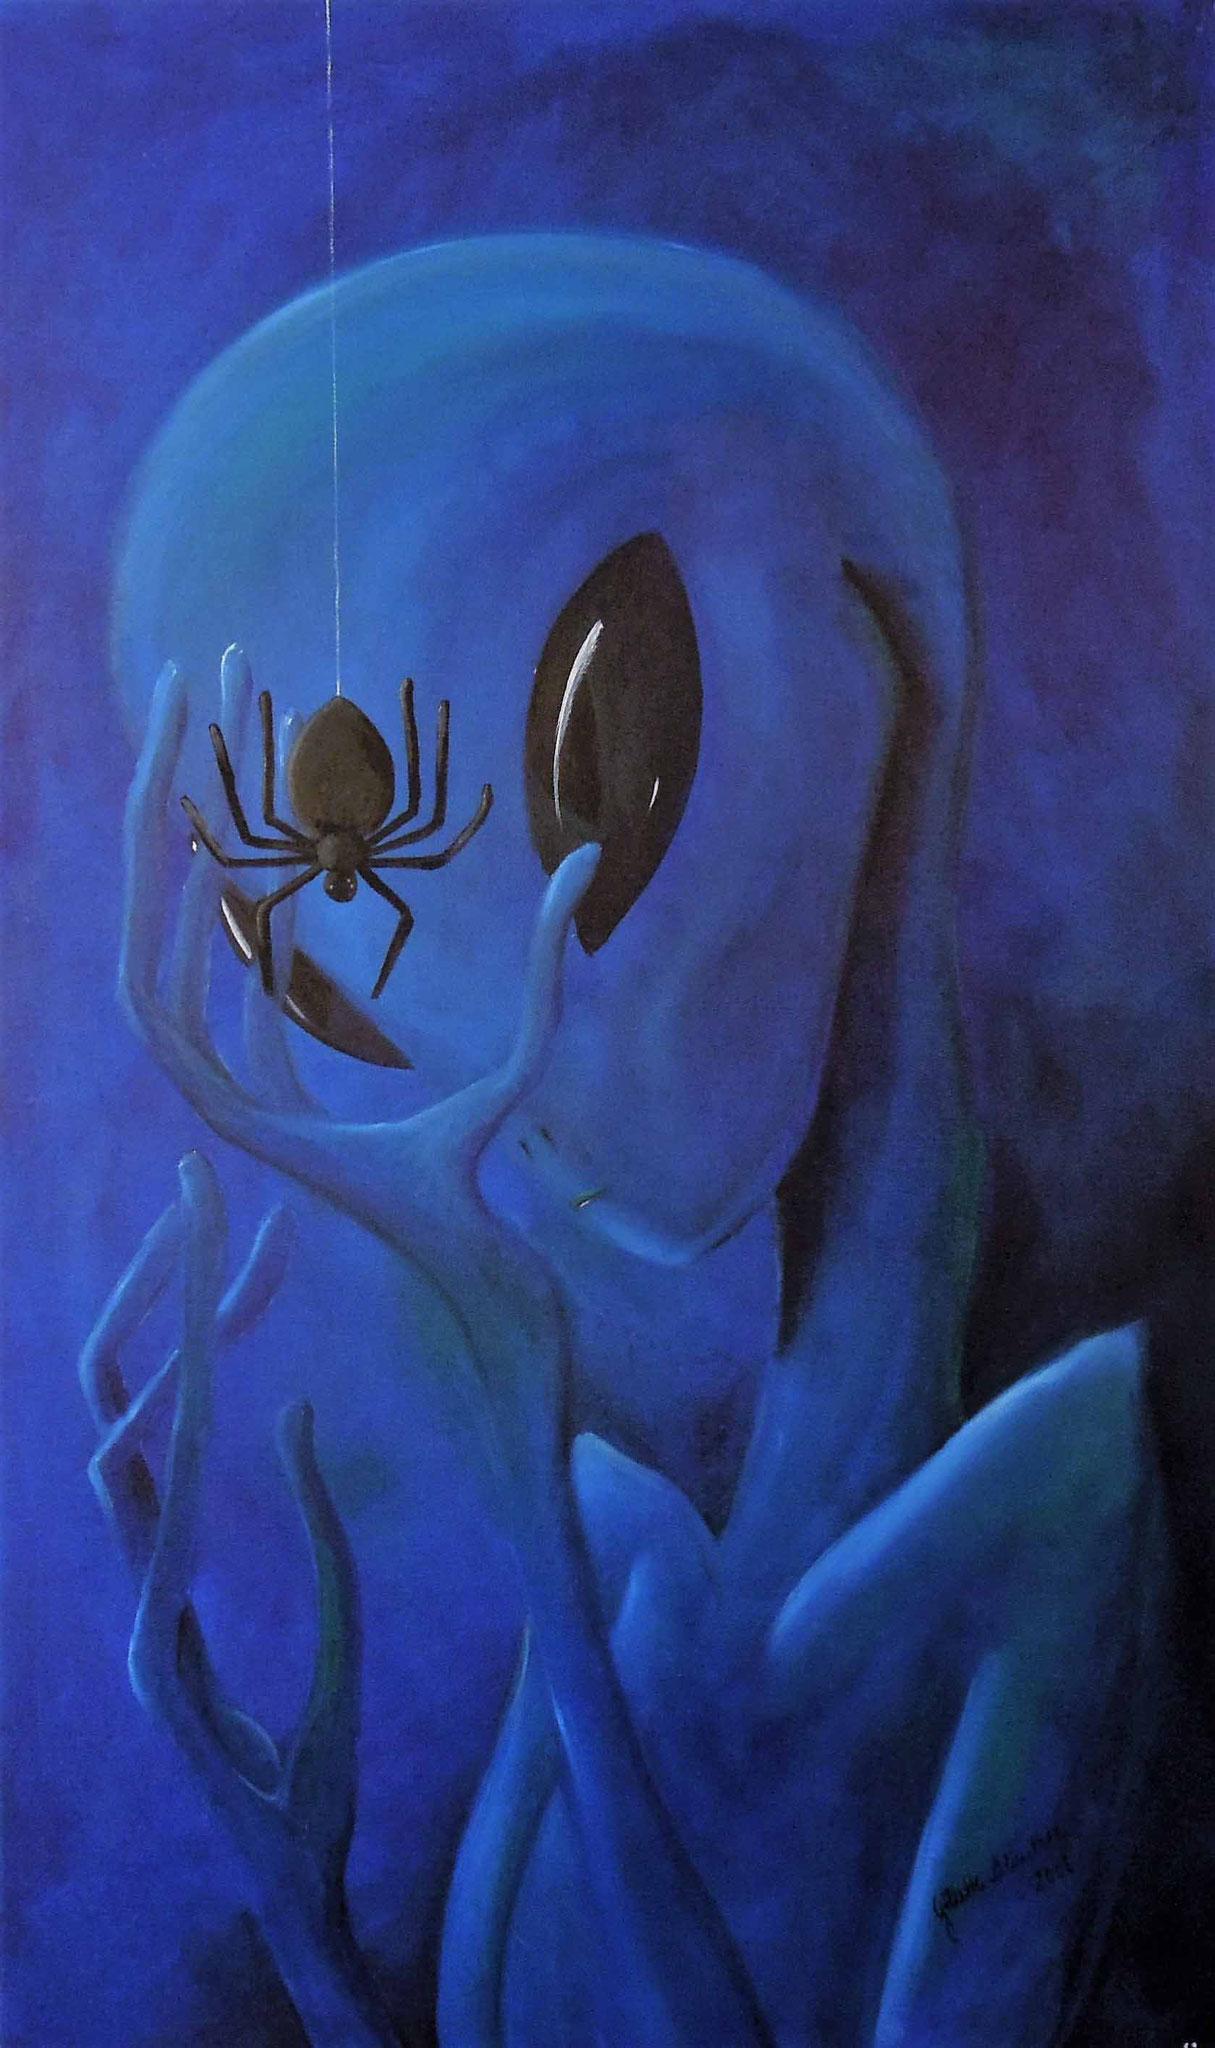 Fremde Wesen - Öl auf Leinwand 60 x 100 cm